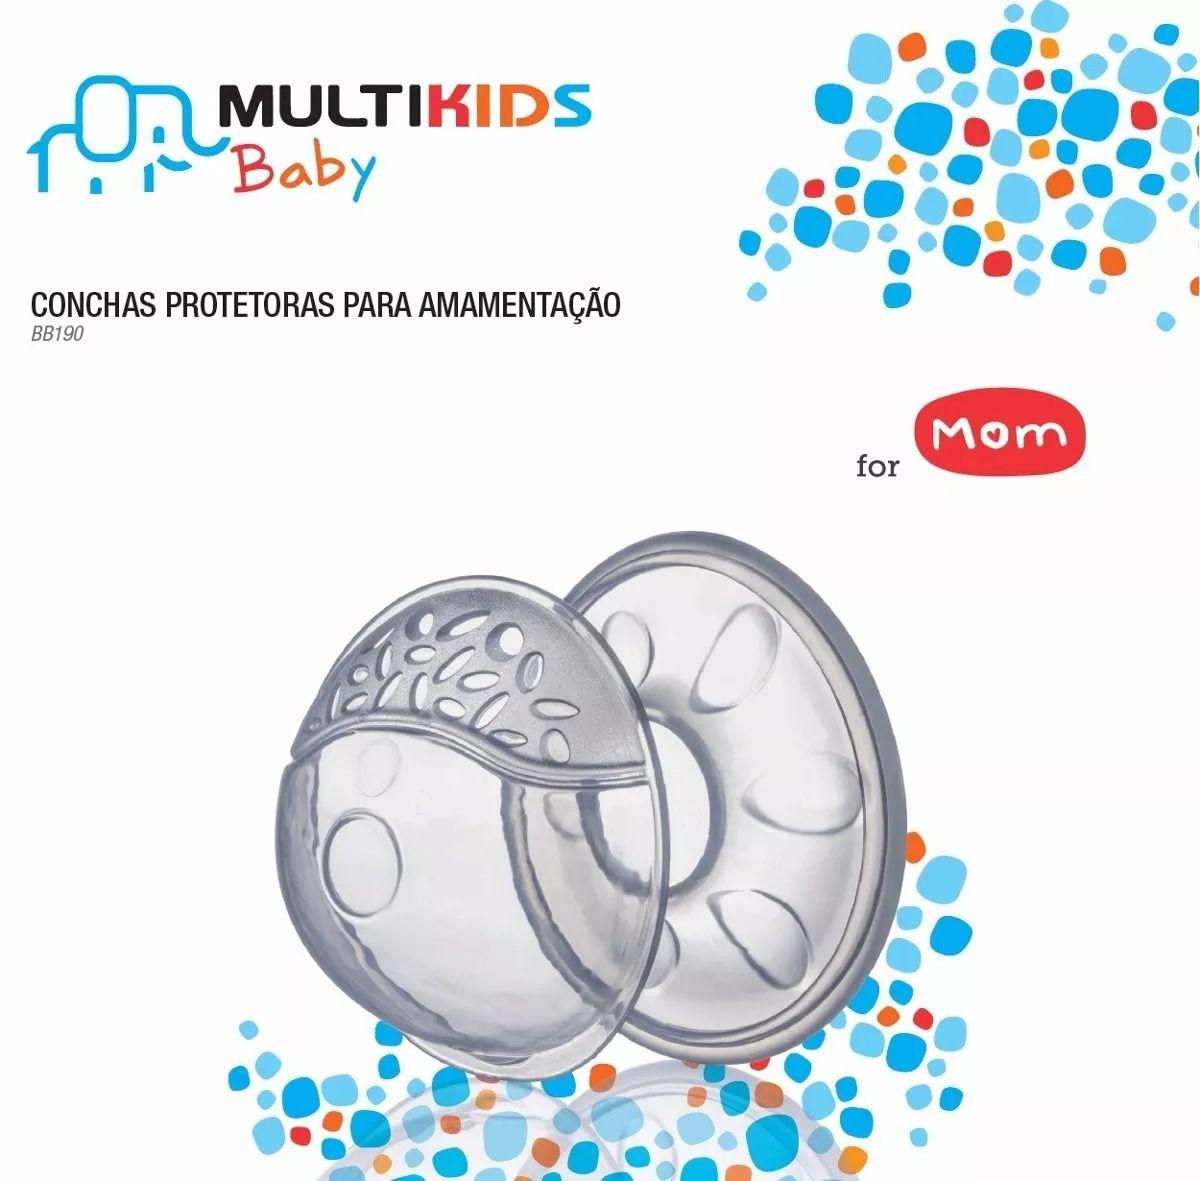 Kit Conchas Protetoras Para Amamentação + Bomba Manual Tira Leite BB190 BB010